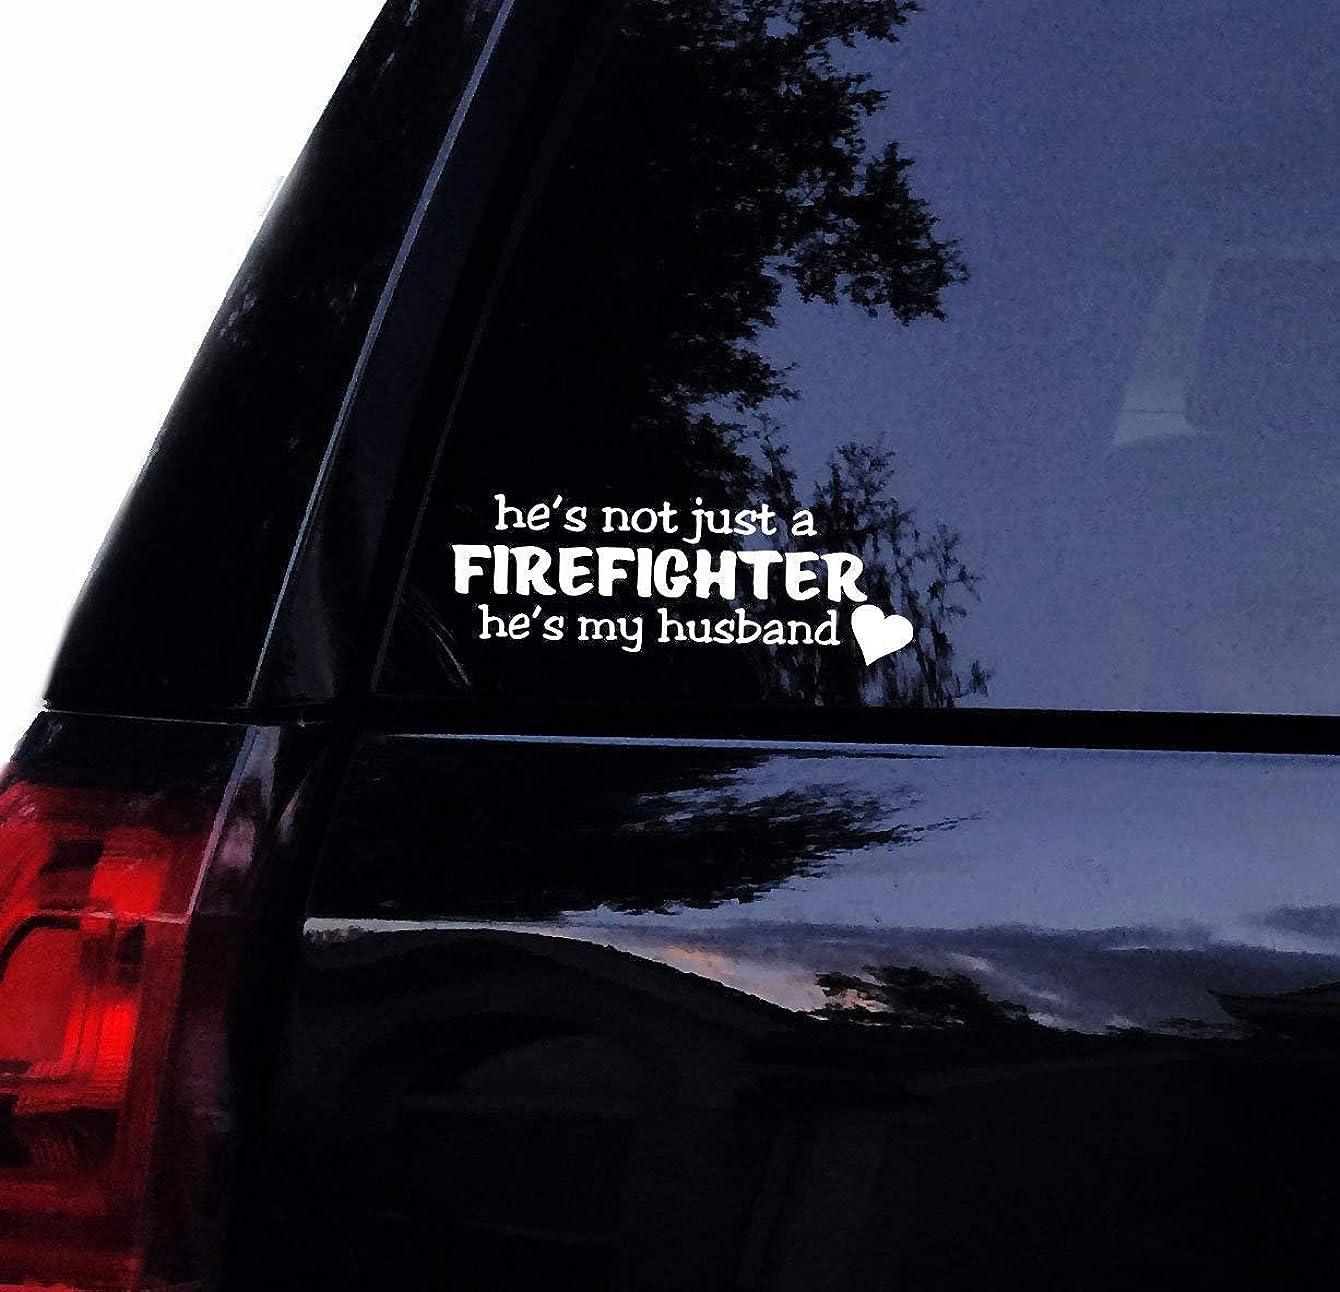 CELYCASY Fireman Fire Fighter Decal - He's Not just a Firefighter, He's My Husband Vinyl Car Decal Laptop Decal Car Window Wall Sticker